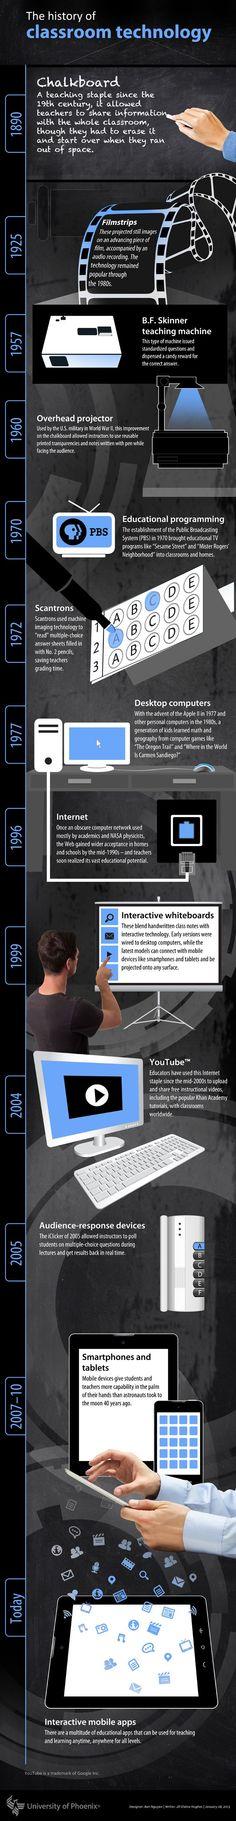 History of Classroom Technology #edtech